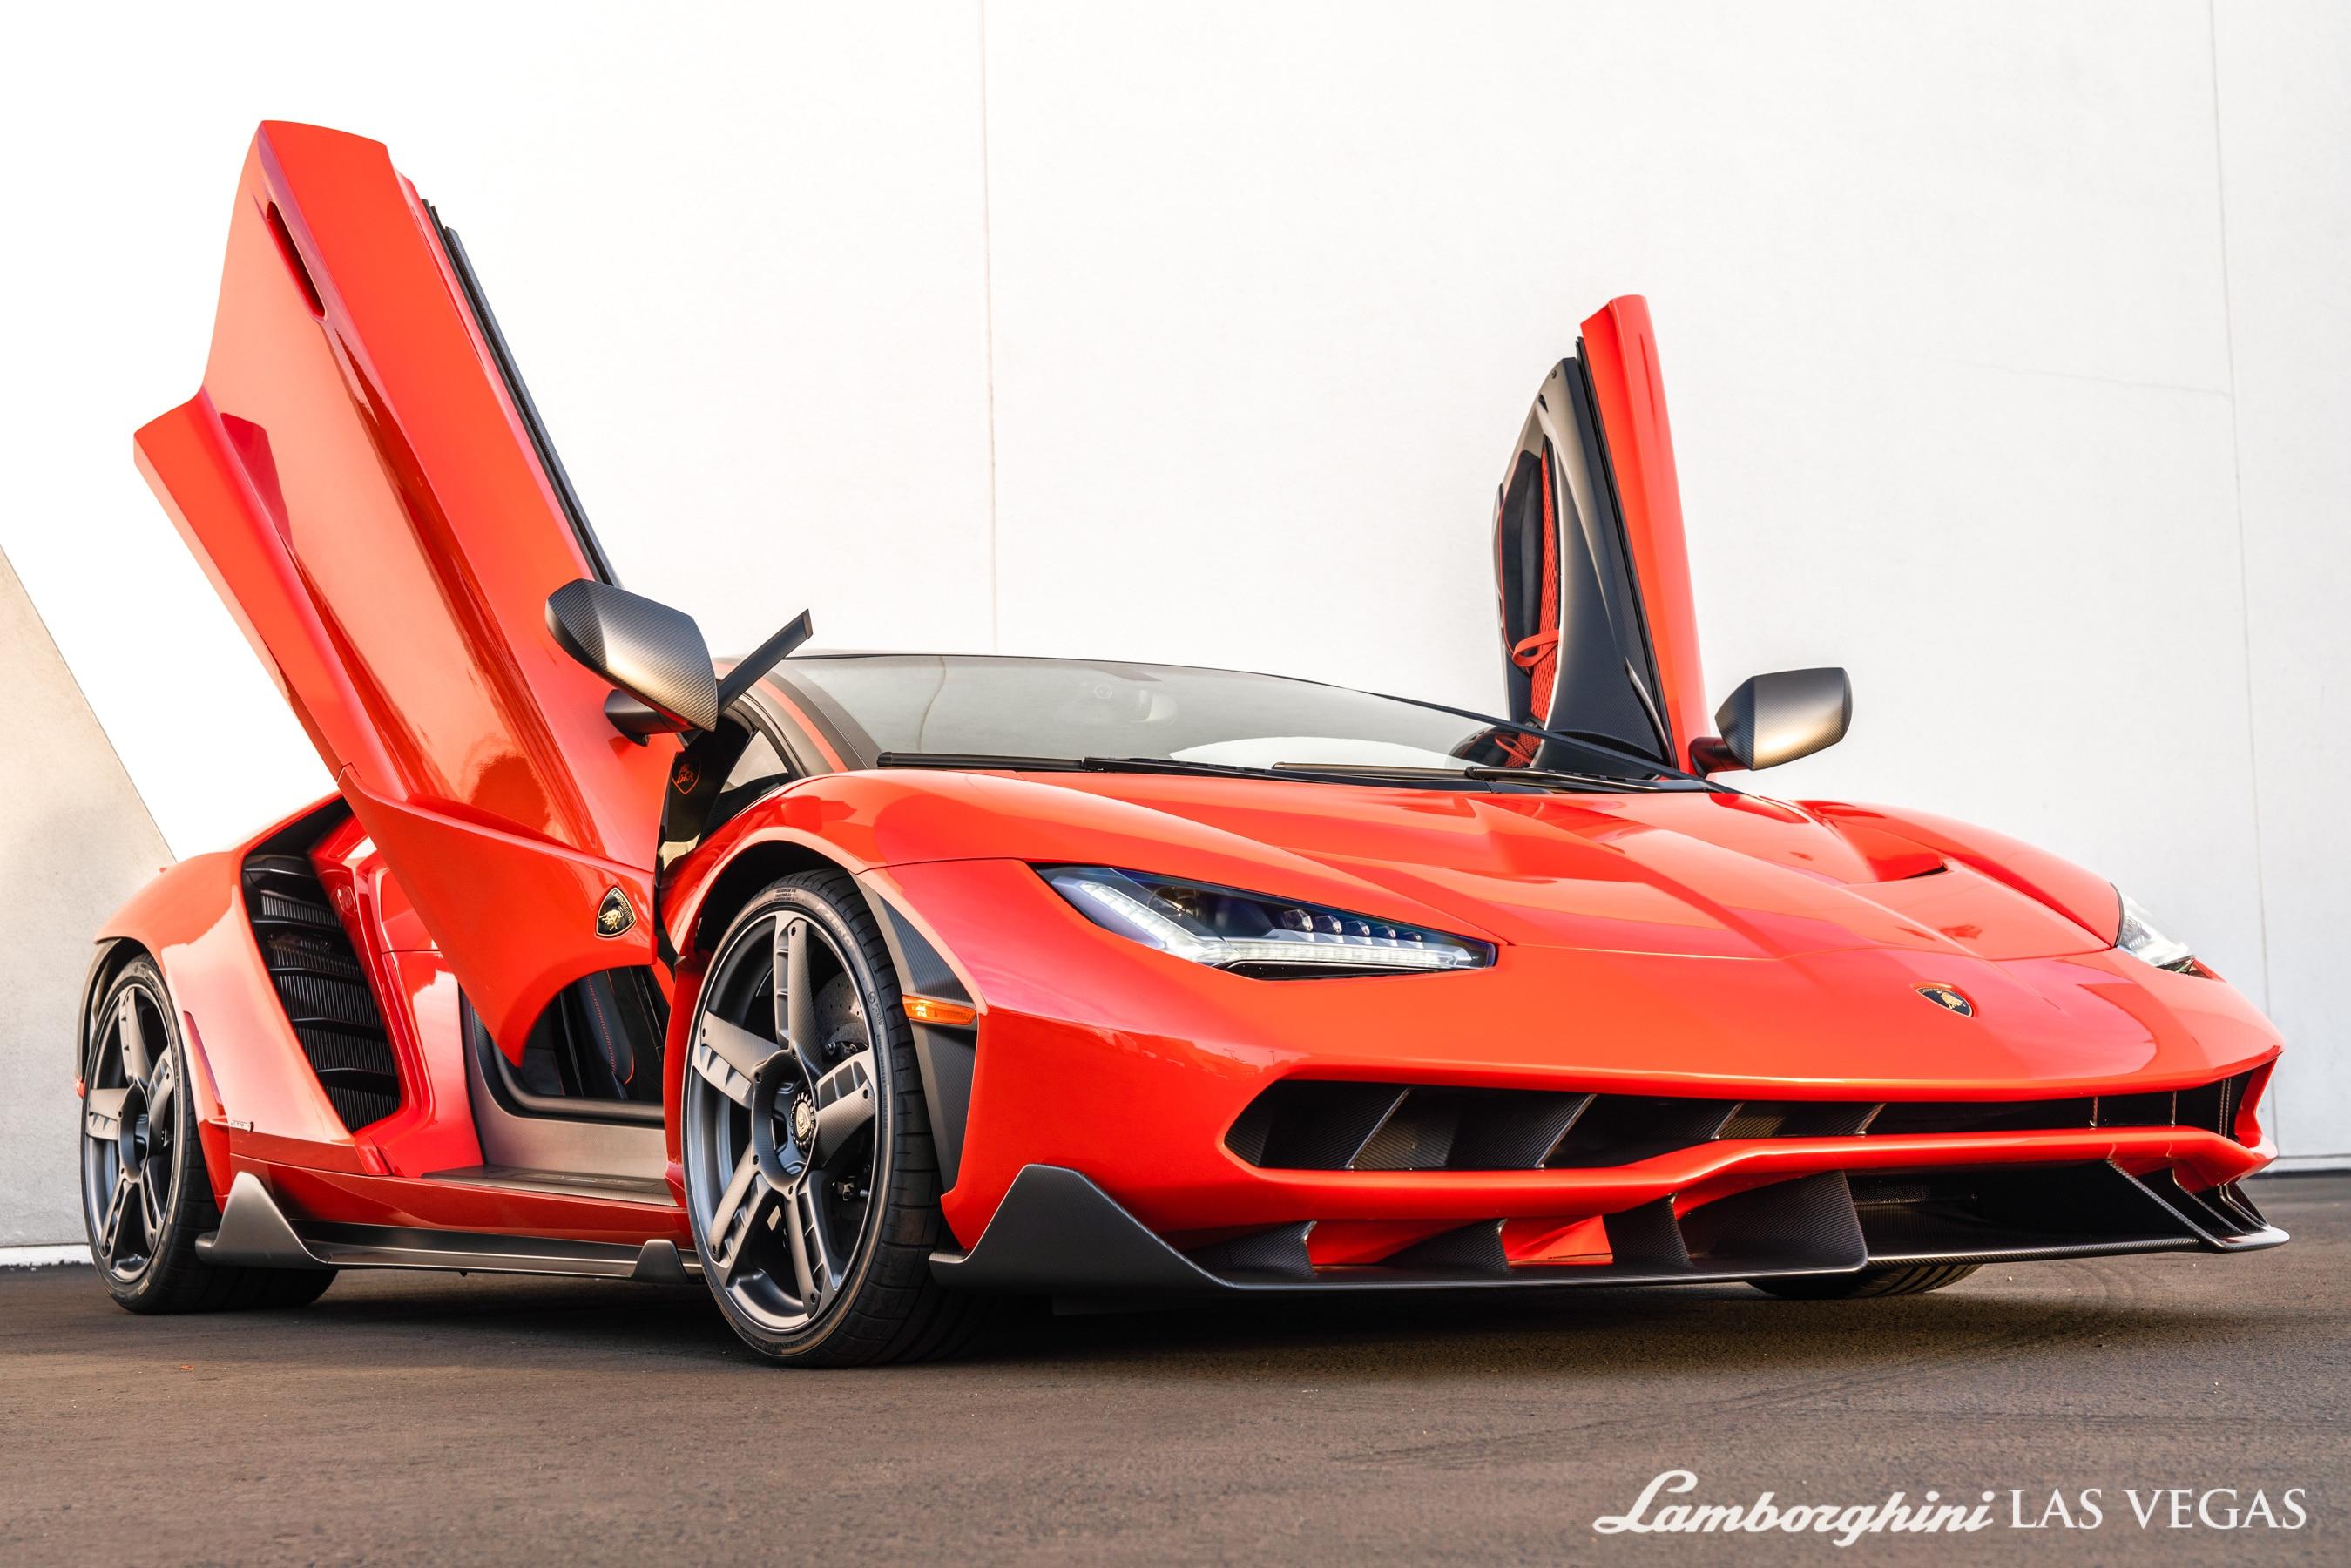 2017 Lamborghini Centenario LP770-4 Coupe